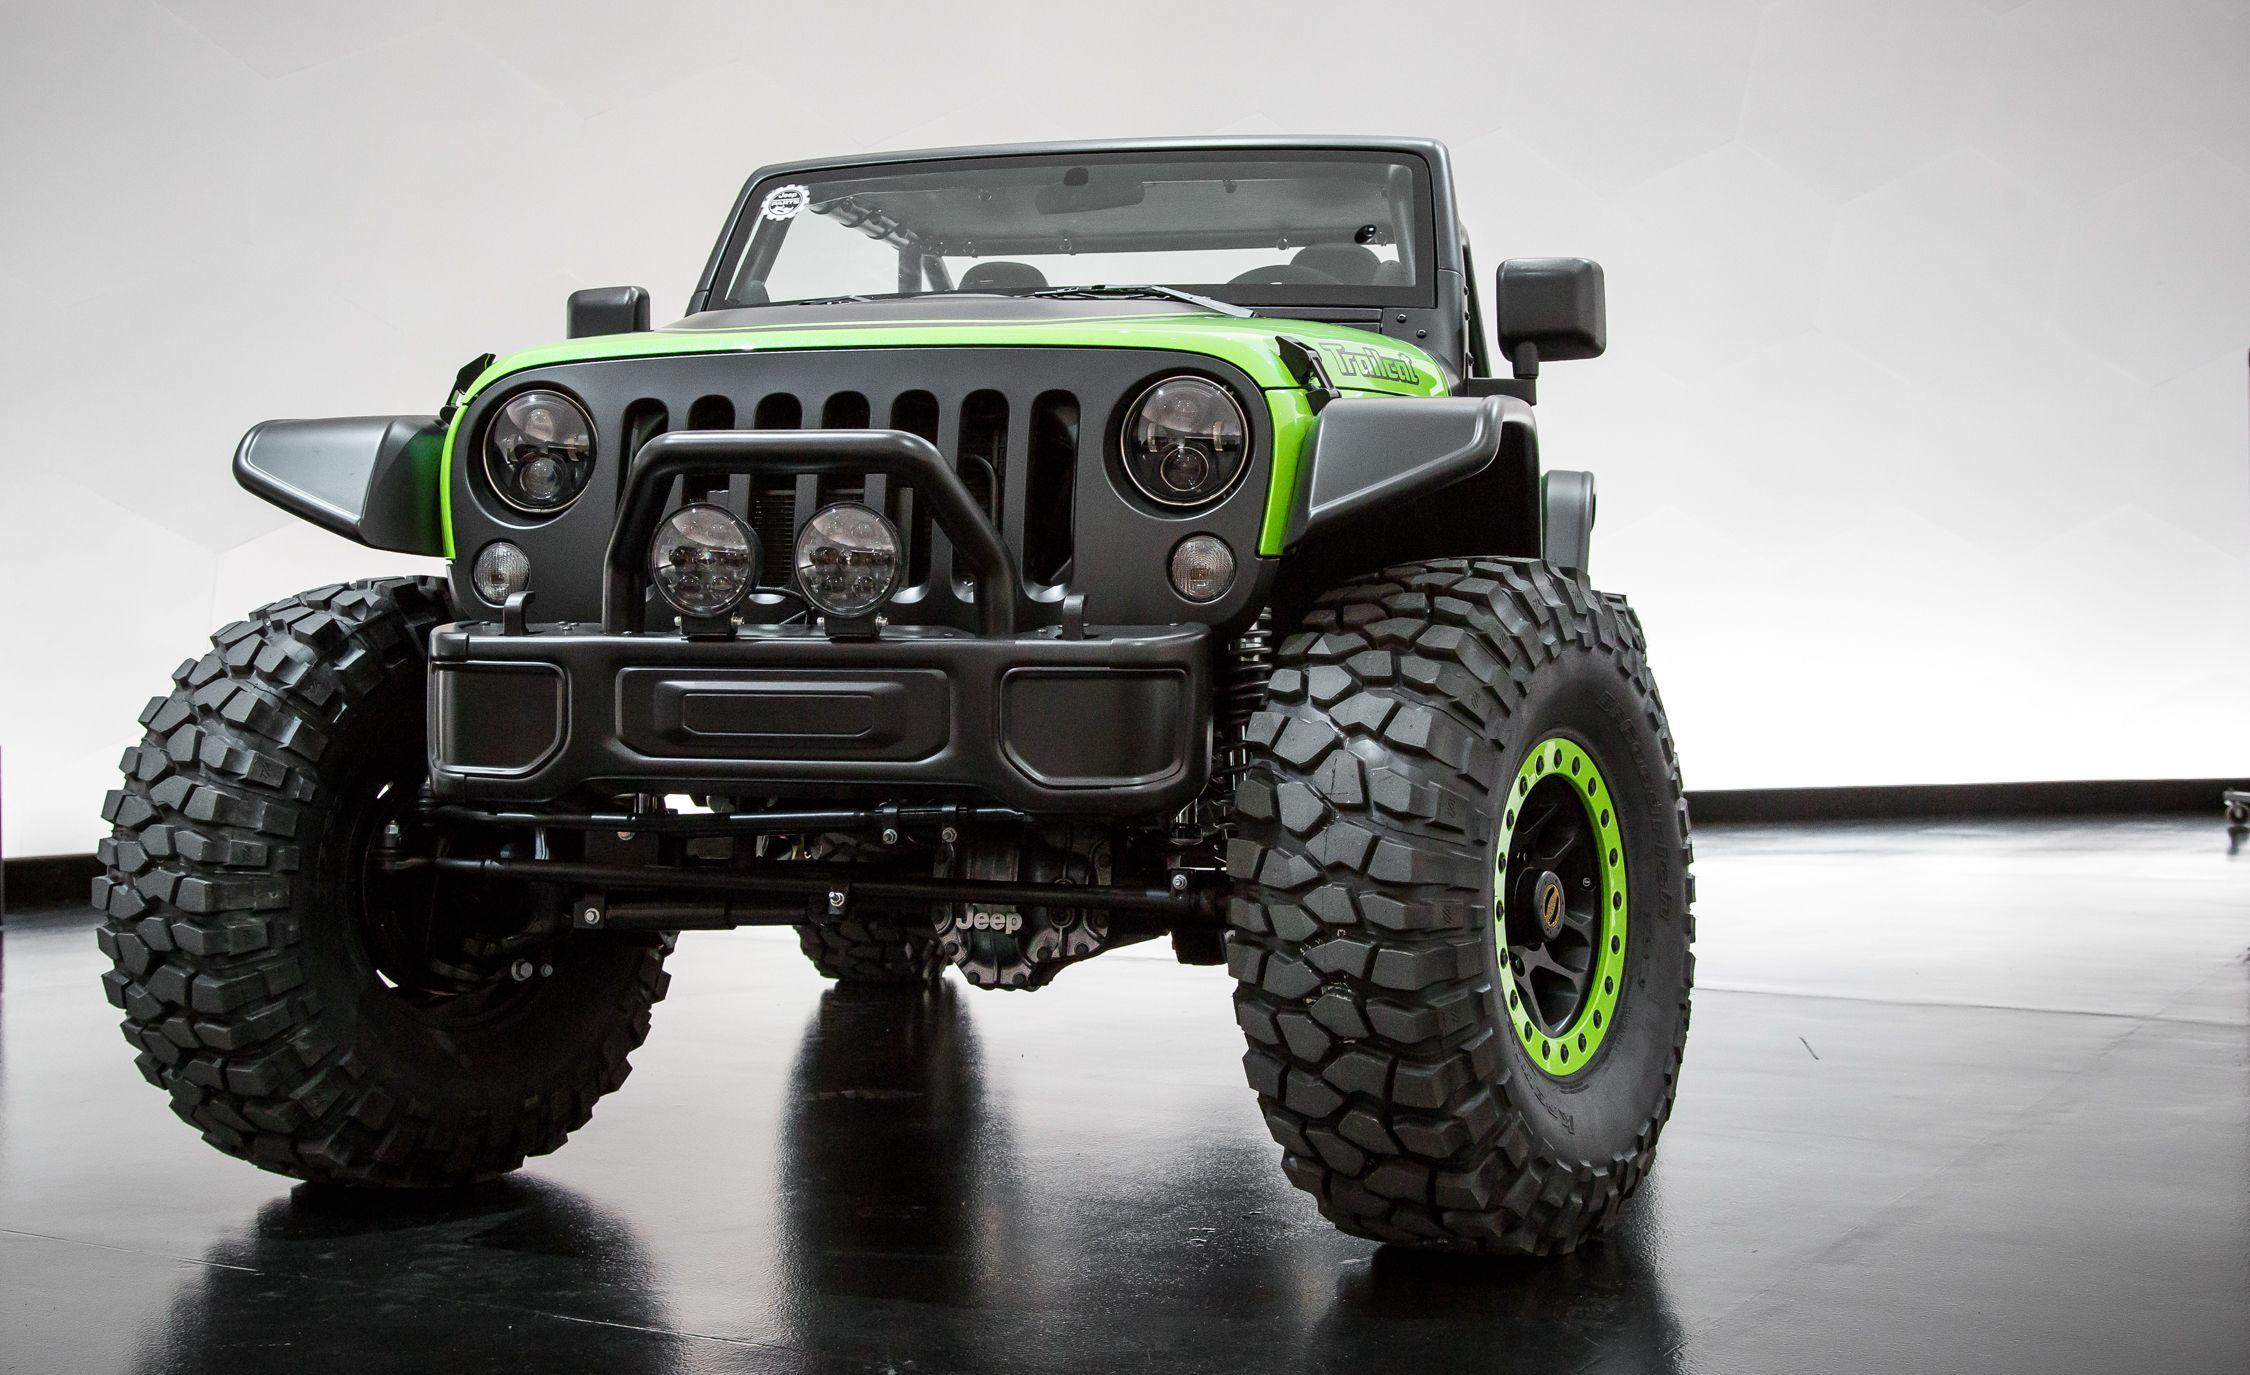 2017 jeep wrangler concept design 2017 - 2017 Jeep Wrangler Concept Design 2017 68